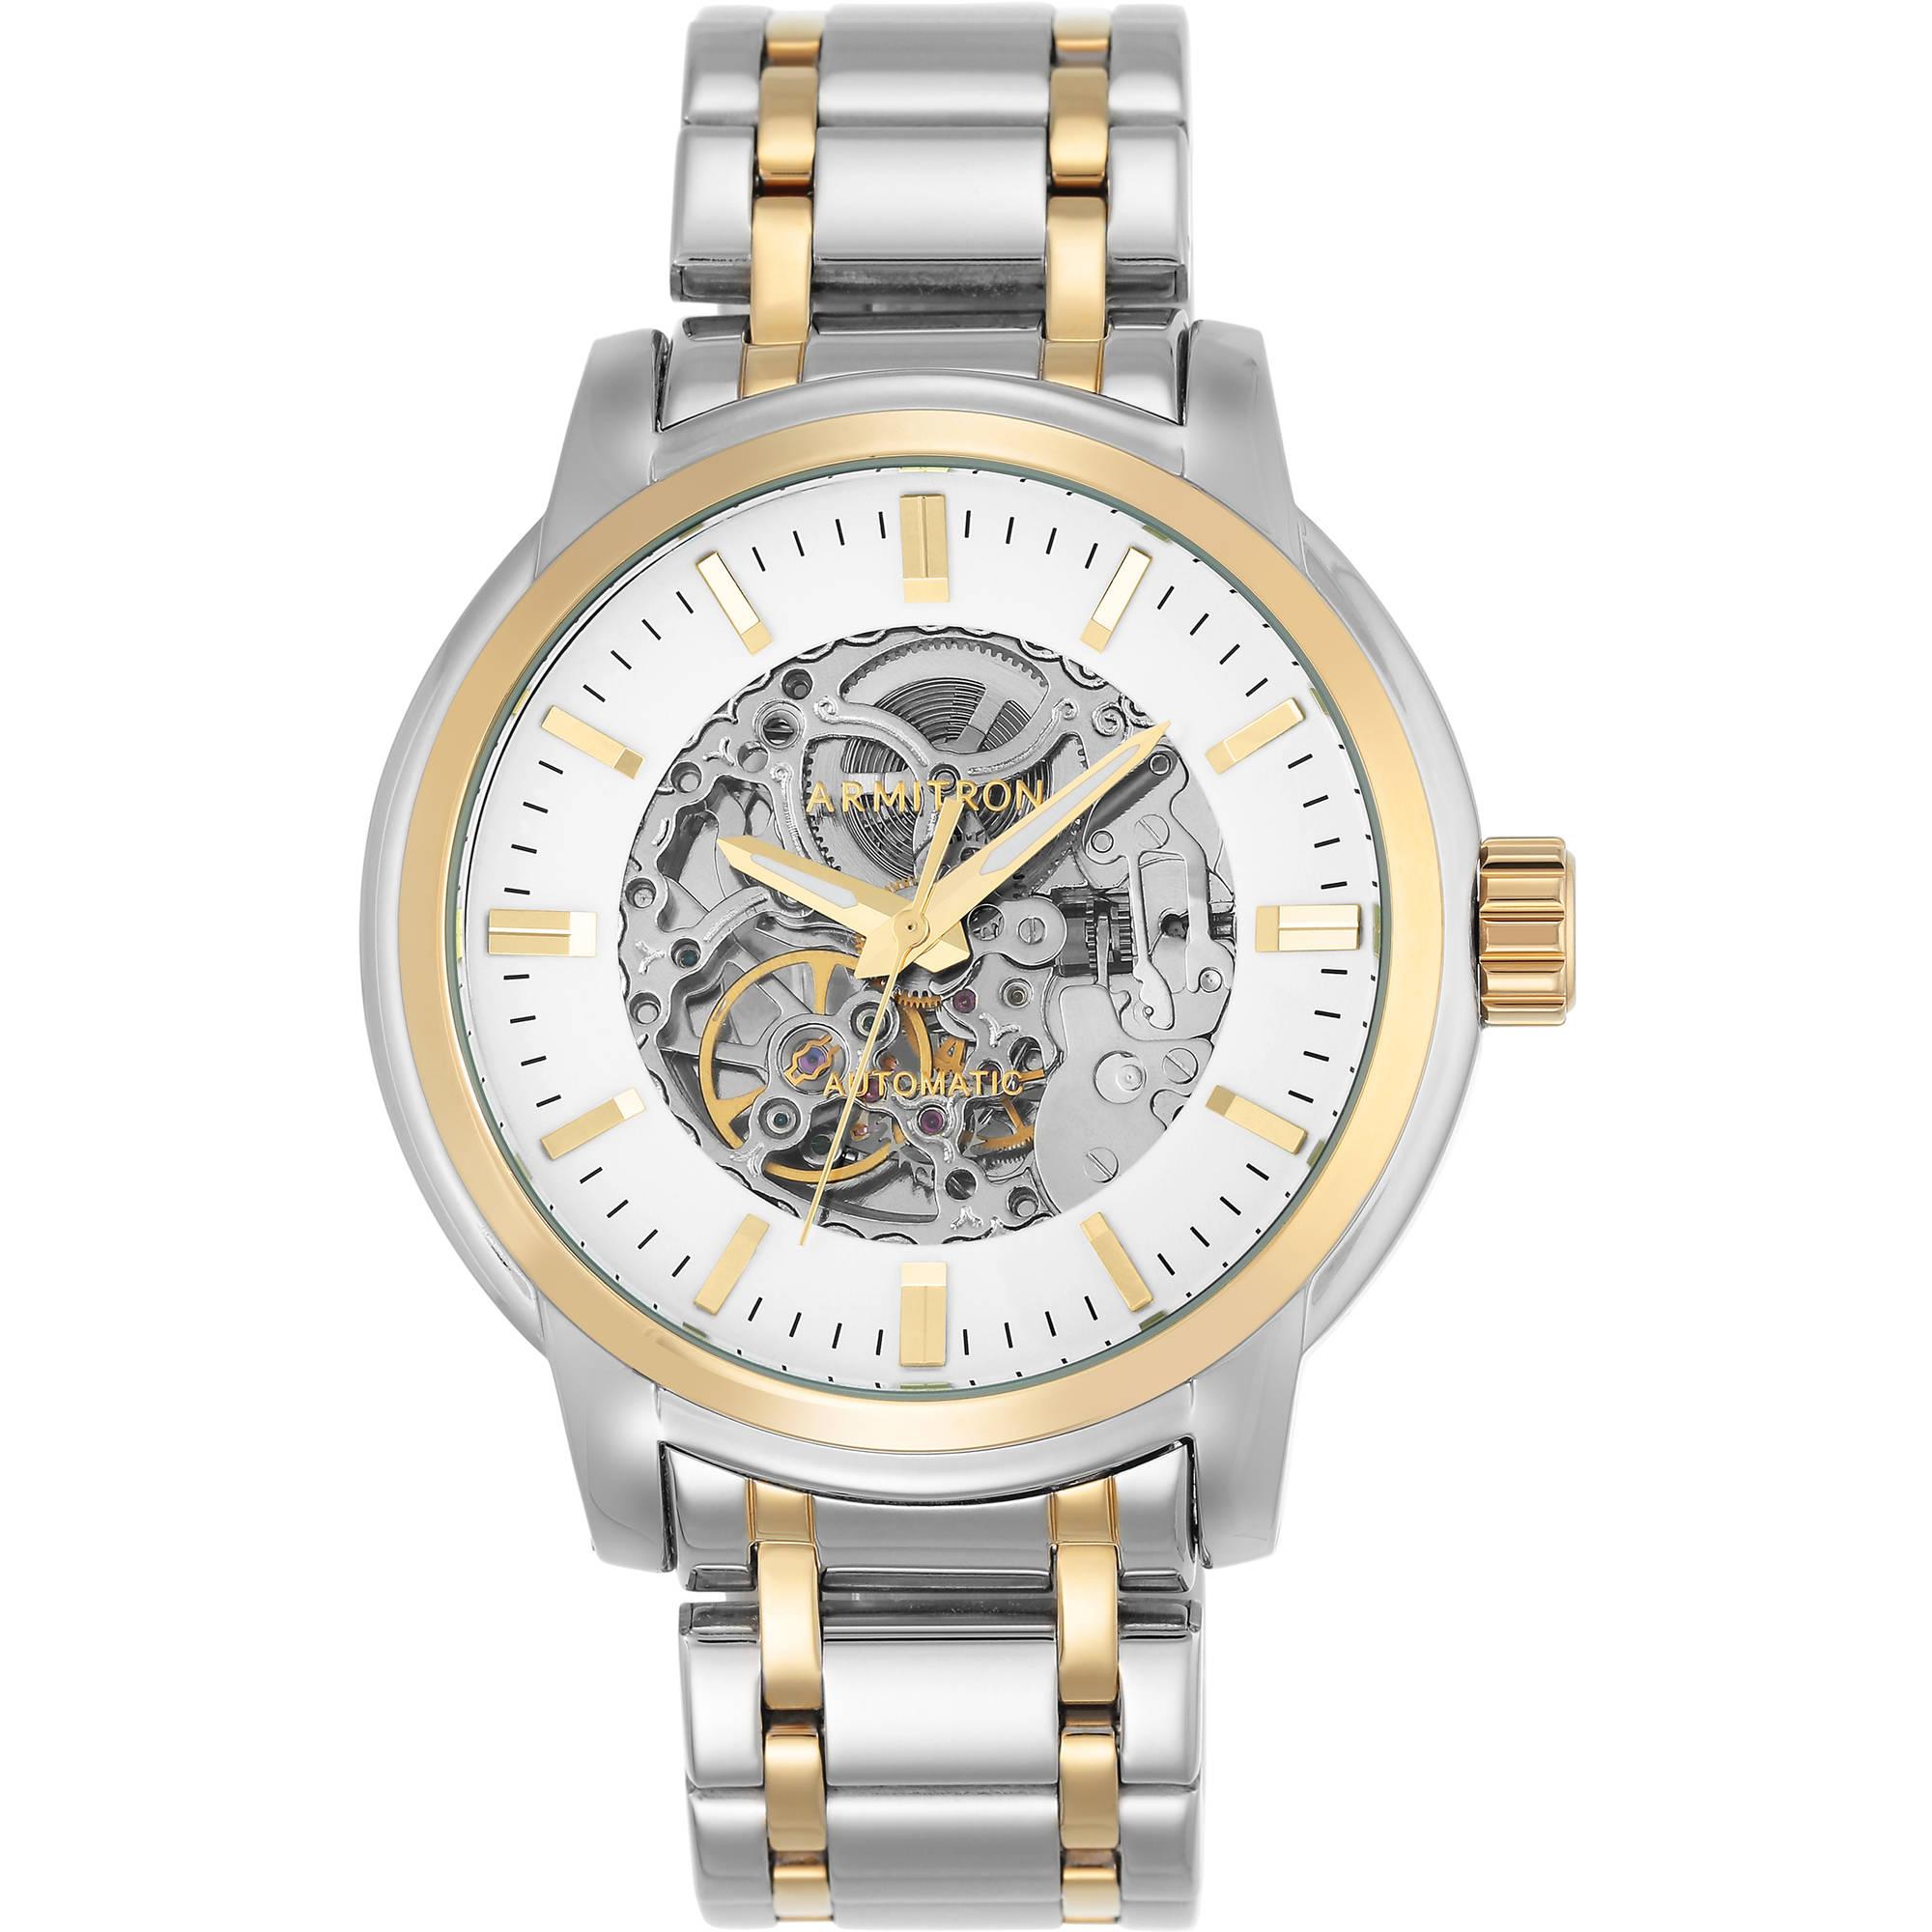 Armitron Men's Dress Automatic Round Watch, Silver Bracelet